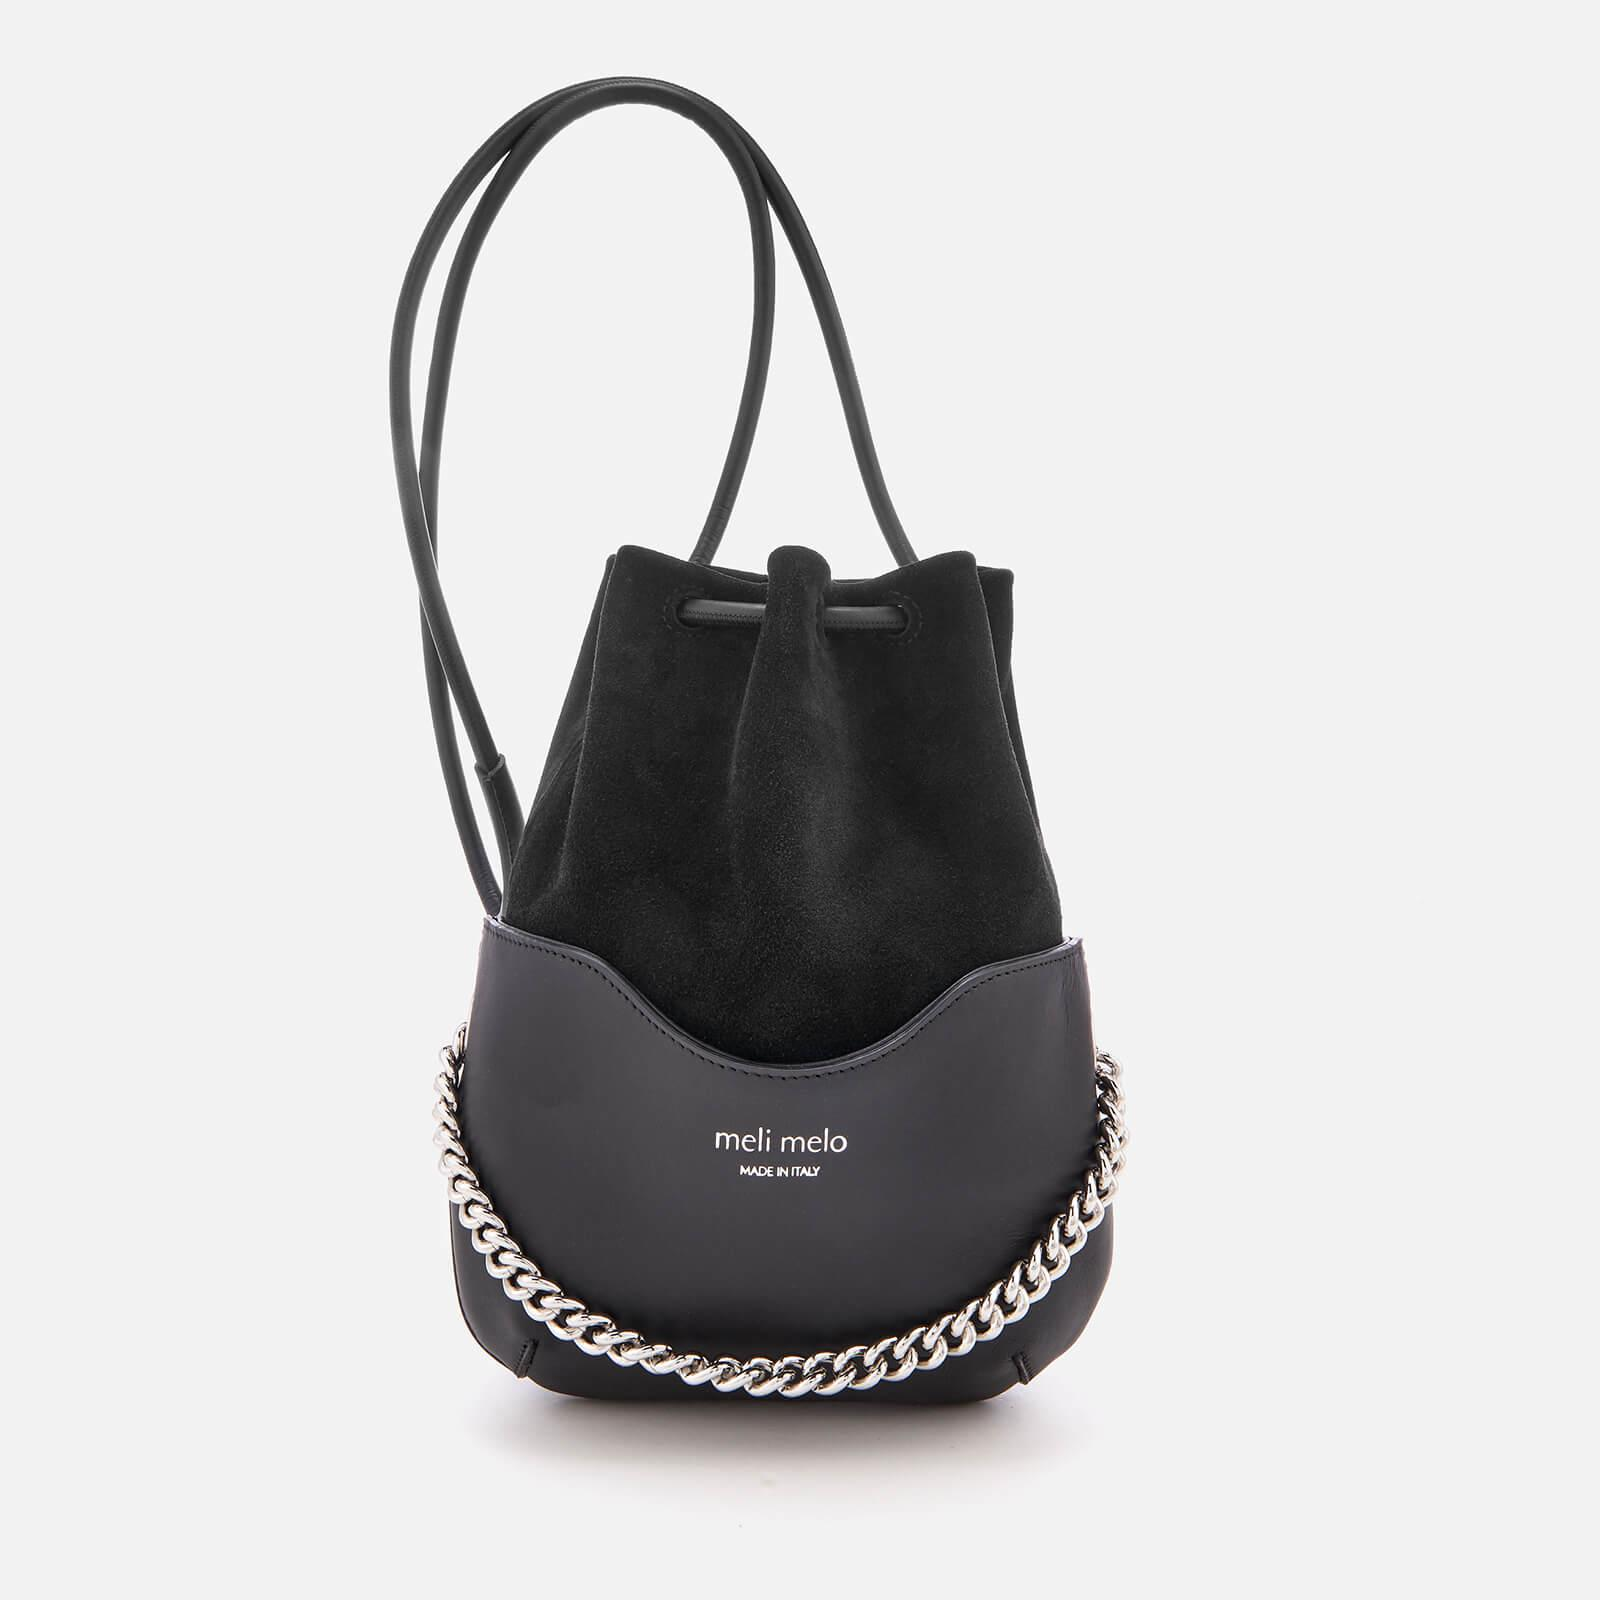 lyst meli melo hetty chain handle bag in black. Black Bedroom Furniture Sets. Home Design Ideas